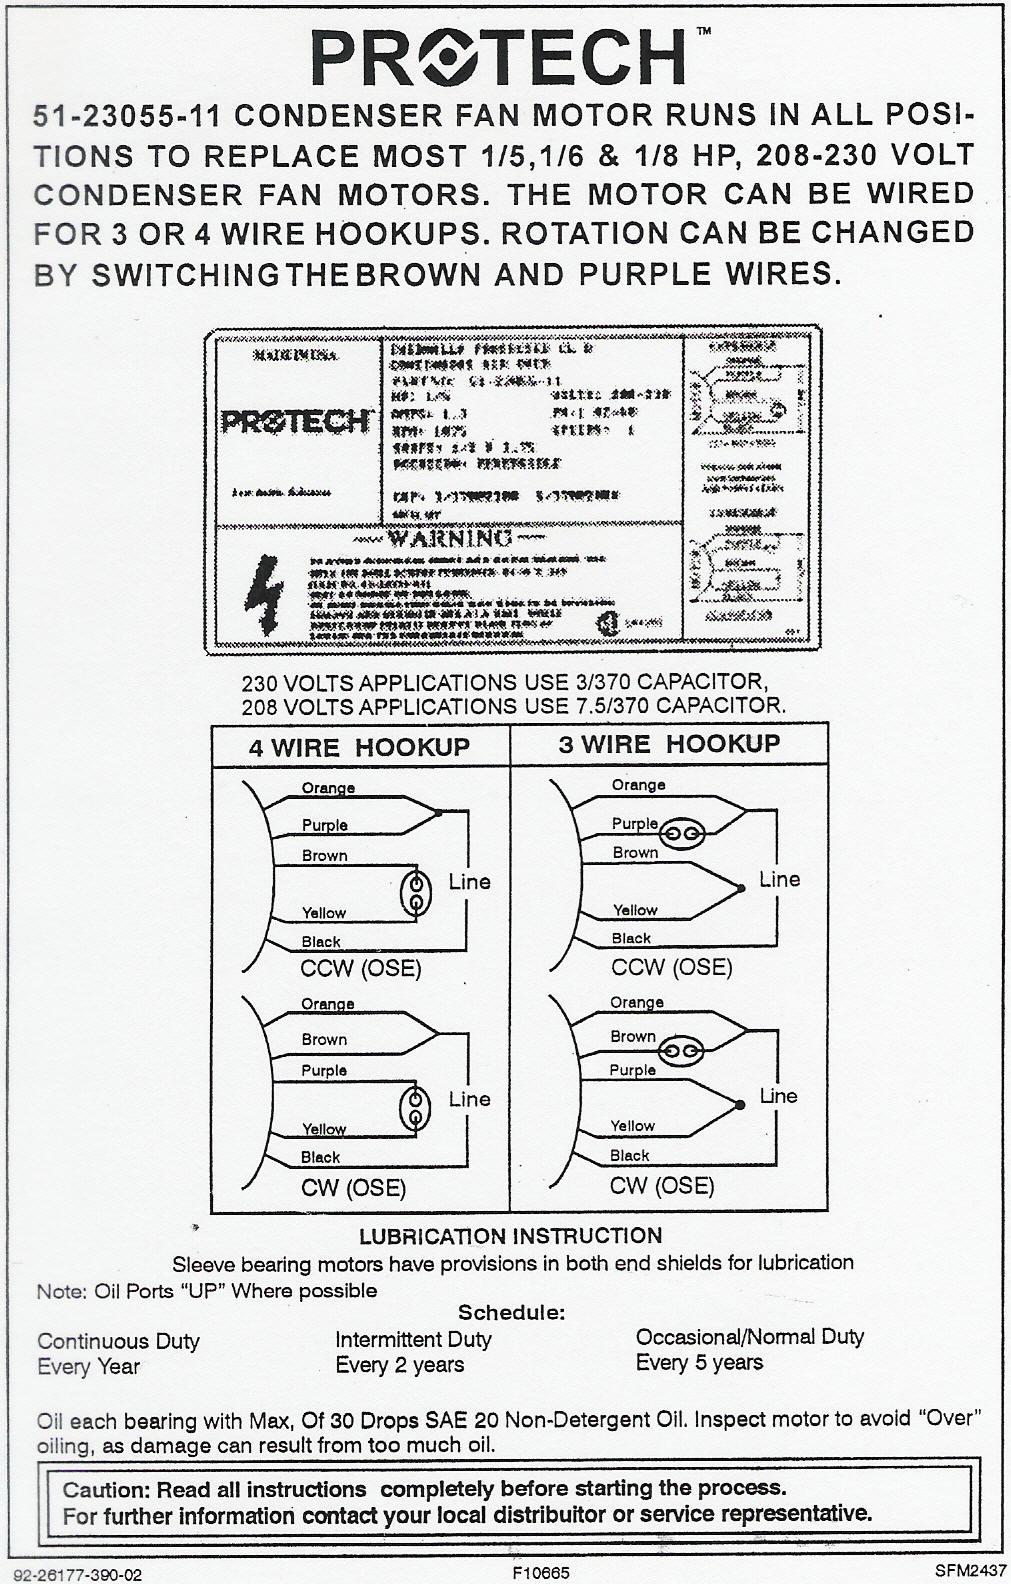 Miraculous Trane Hard Start Kit Wiring Diagram Wiring Library Wiring Cloud Onicaalyptbenolwigegmohammedshrineorg